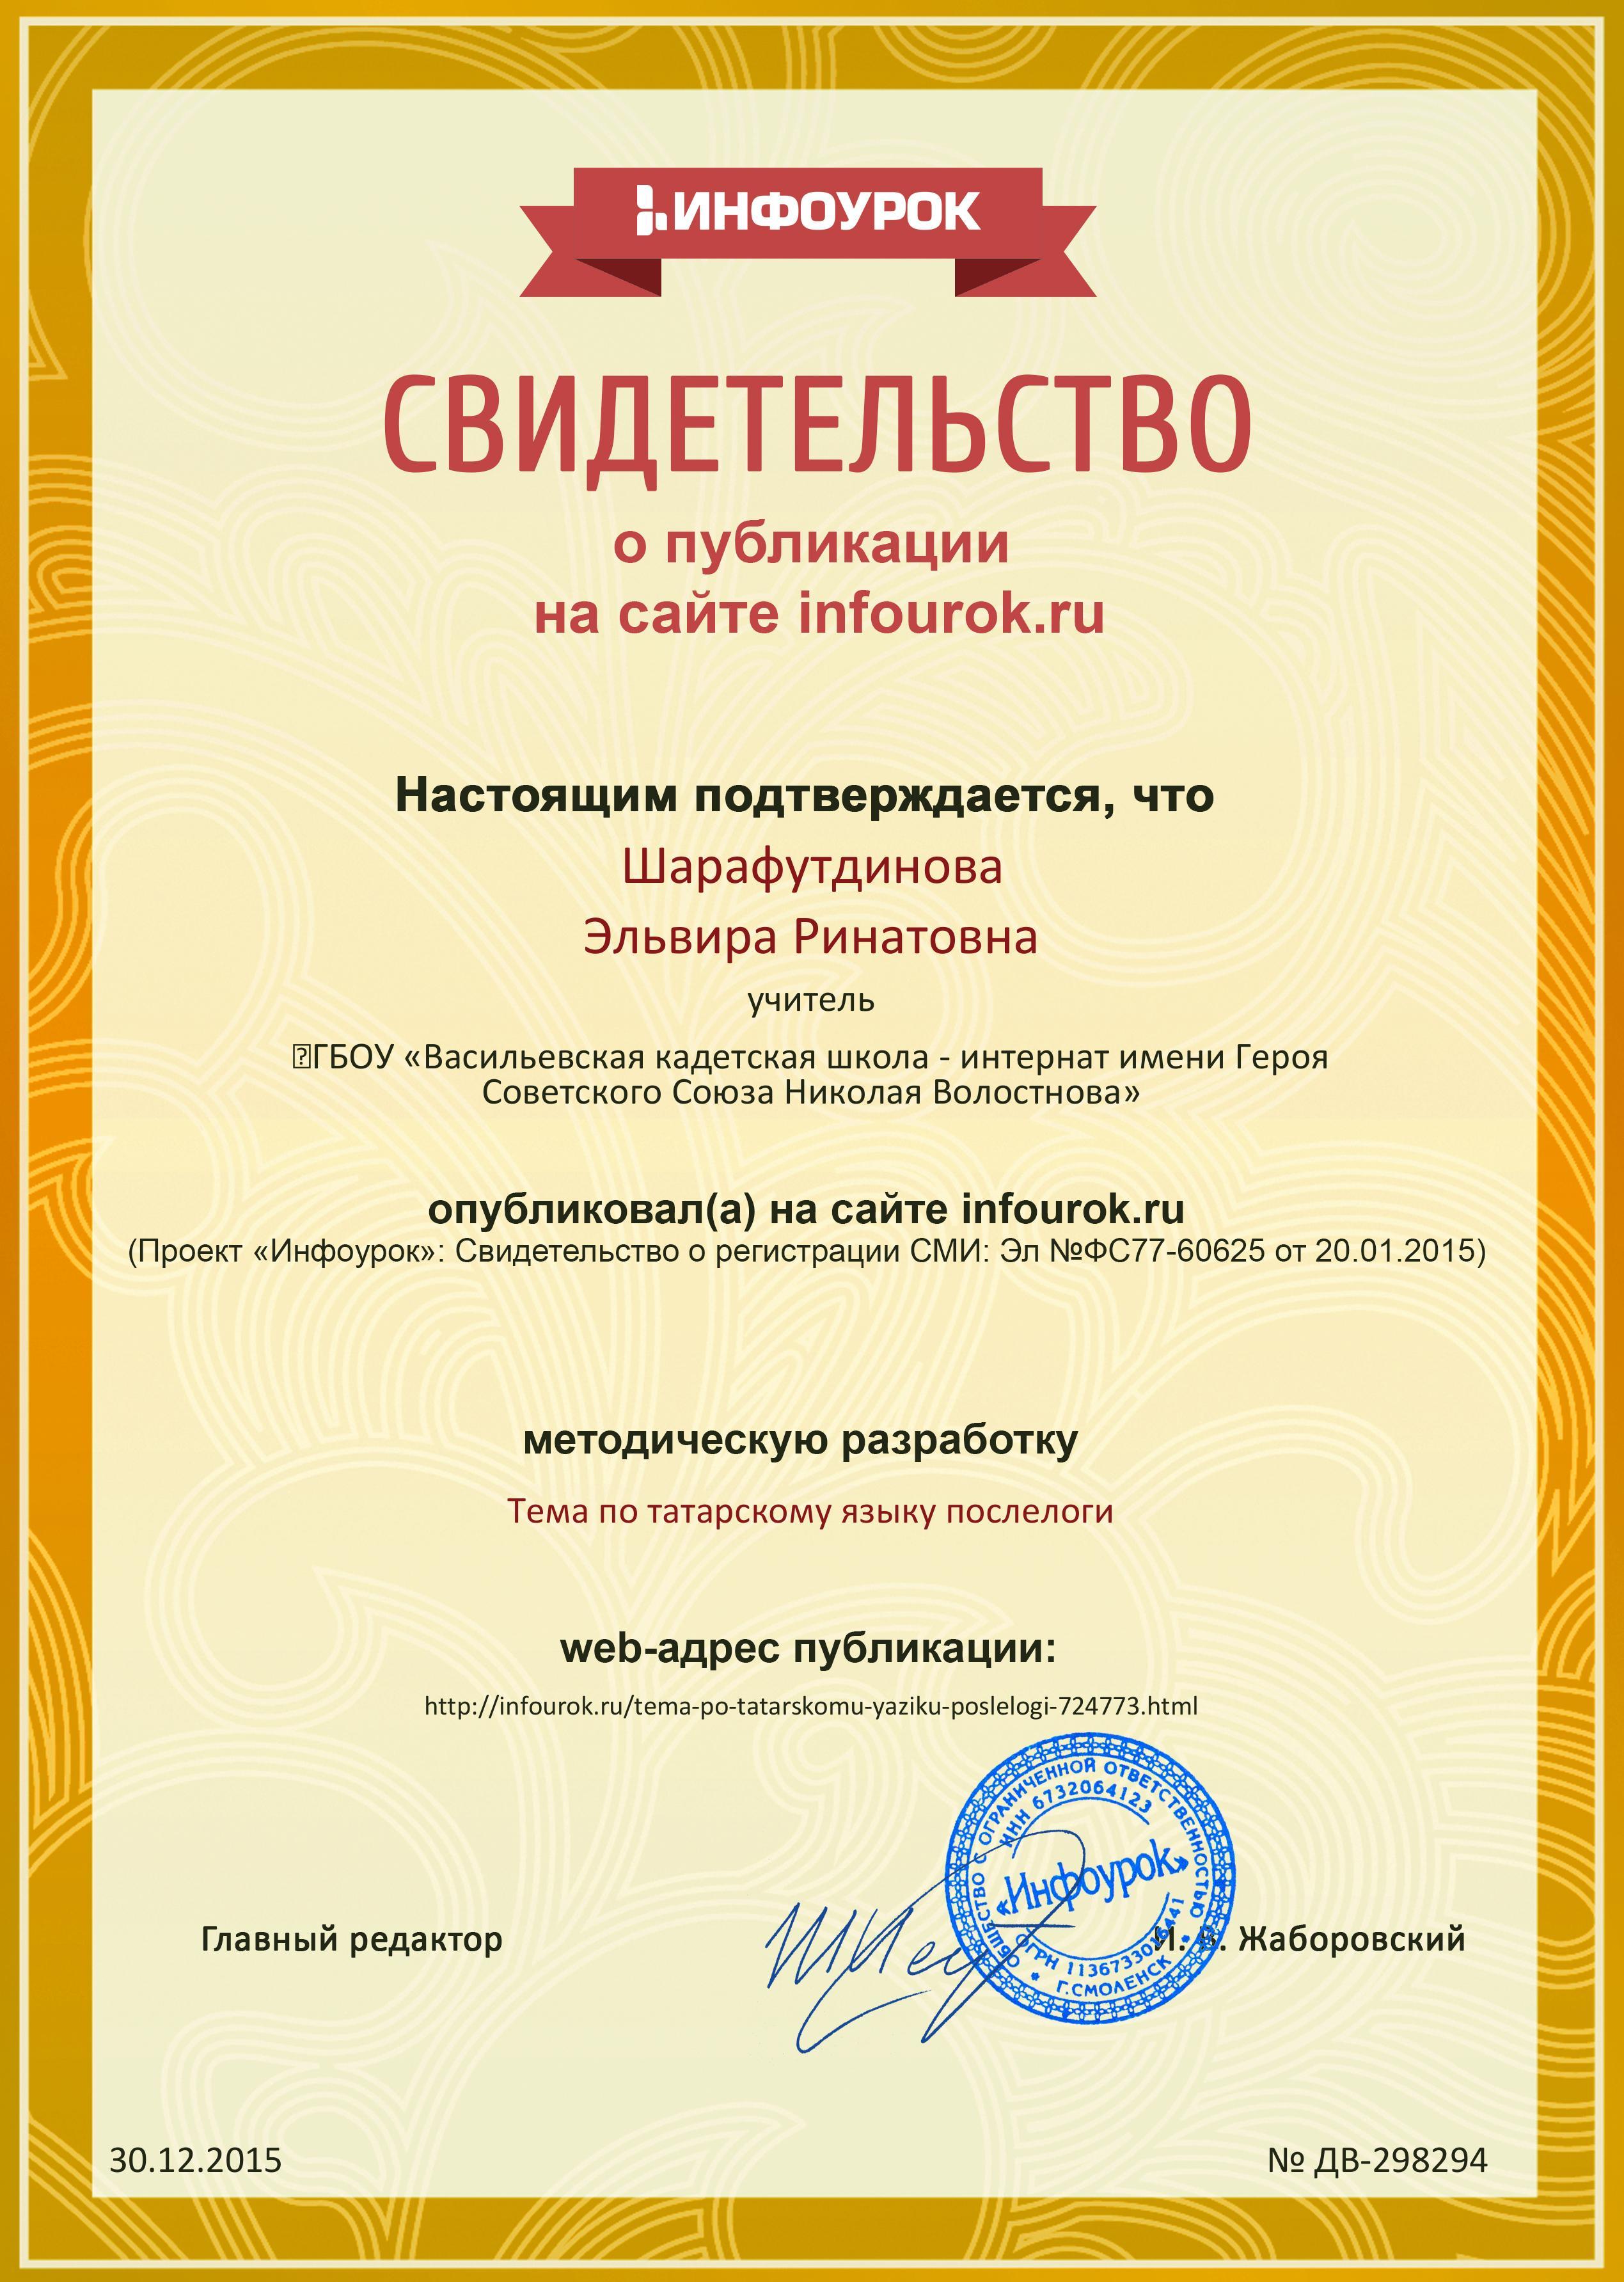 Сертификат проекта infourok.ru № ДВ-298294.jpg